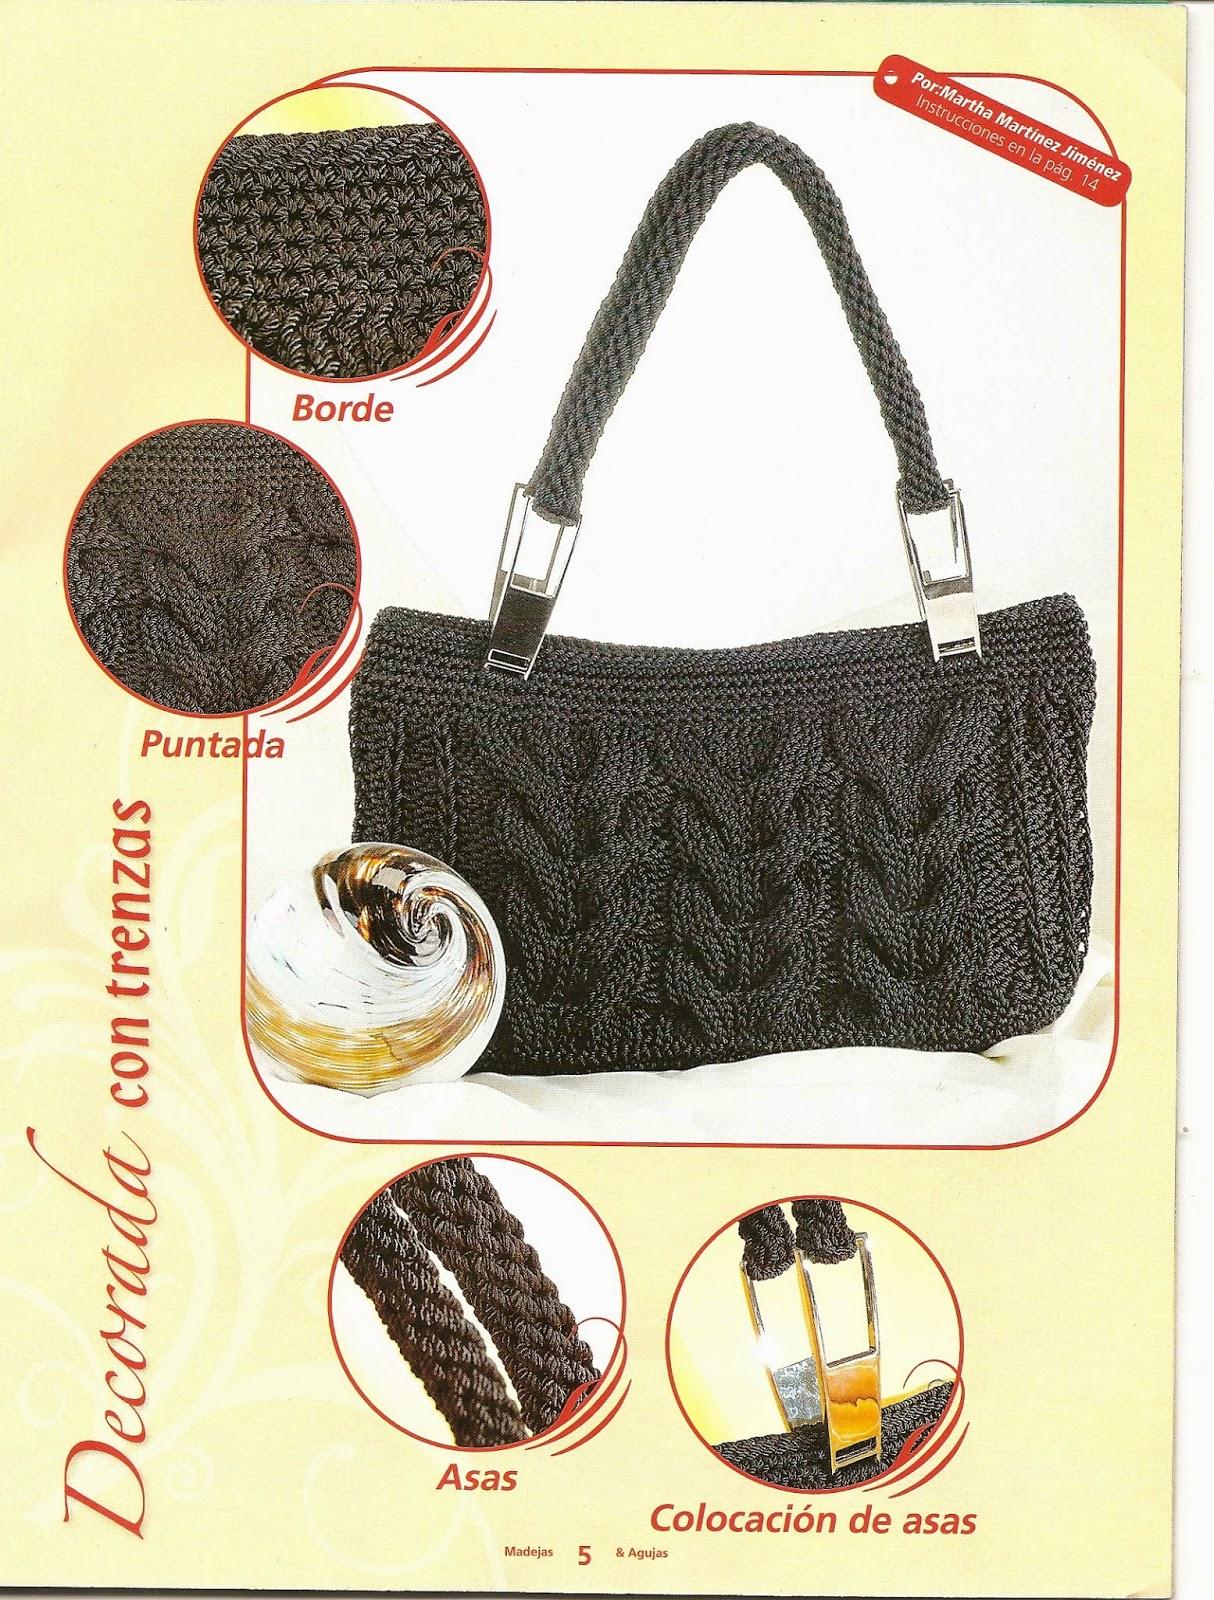 como hacer bolsos con dos agujas revistas de crochet y On como hacer bolsos de lana a dos agujas